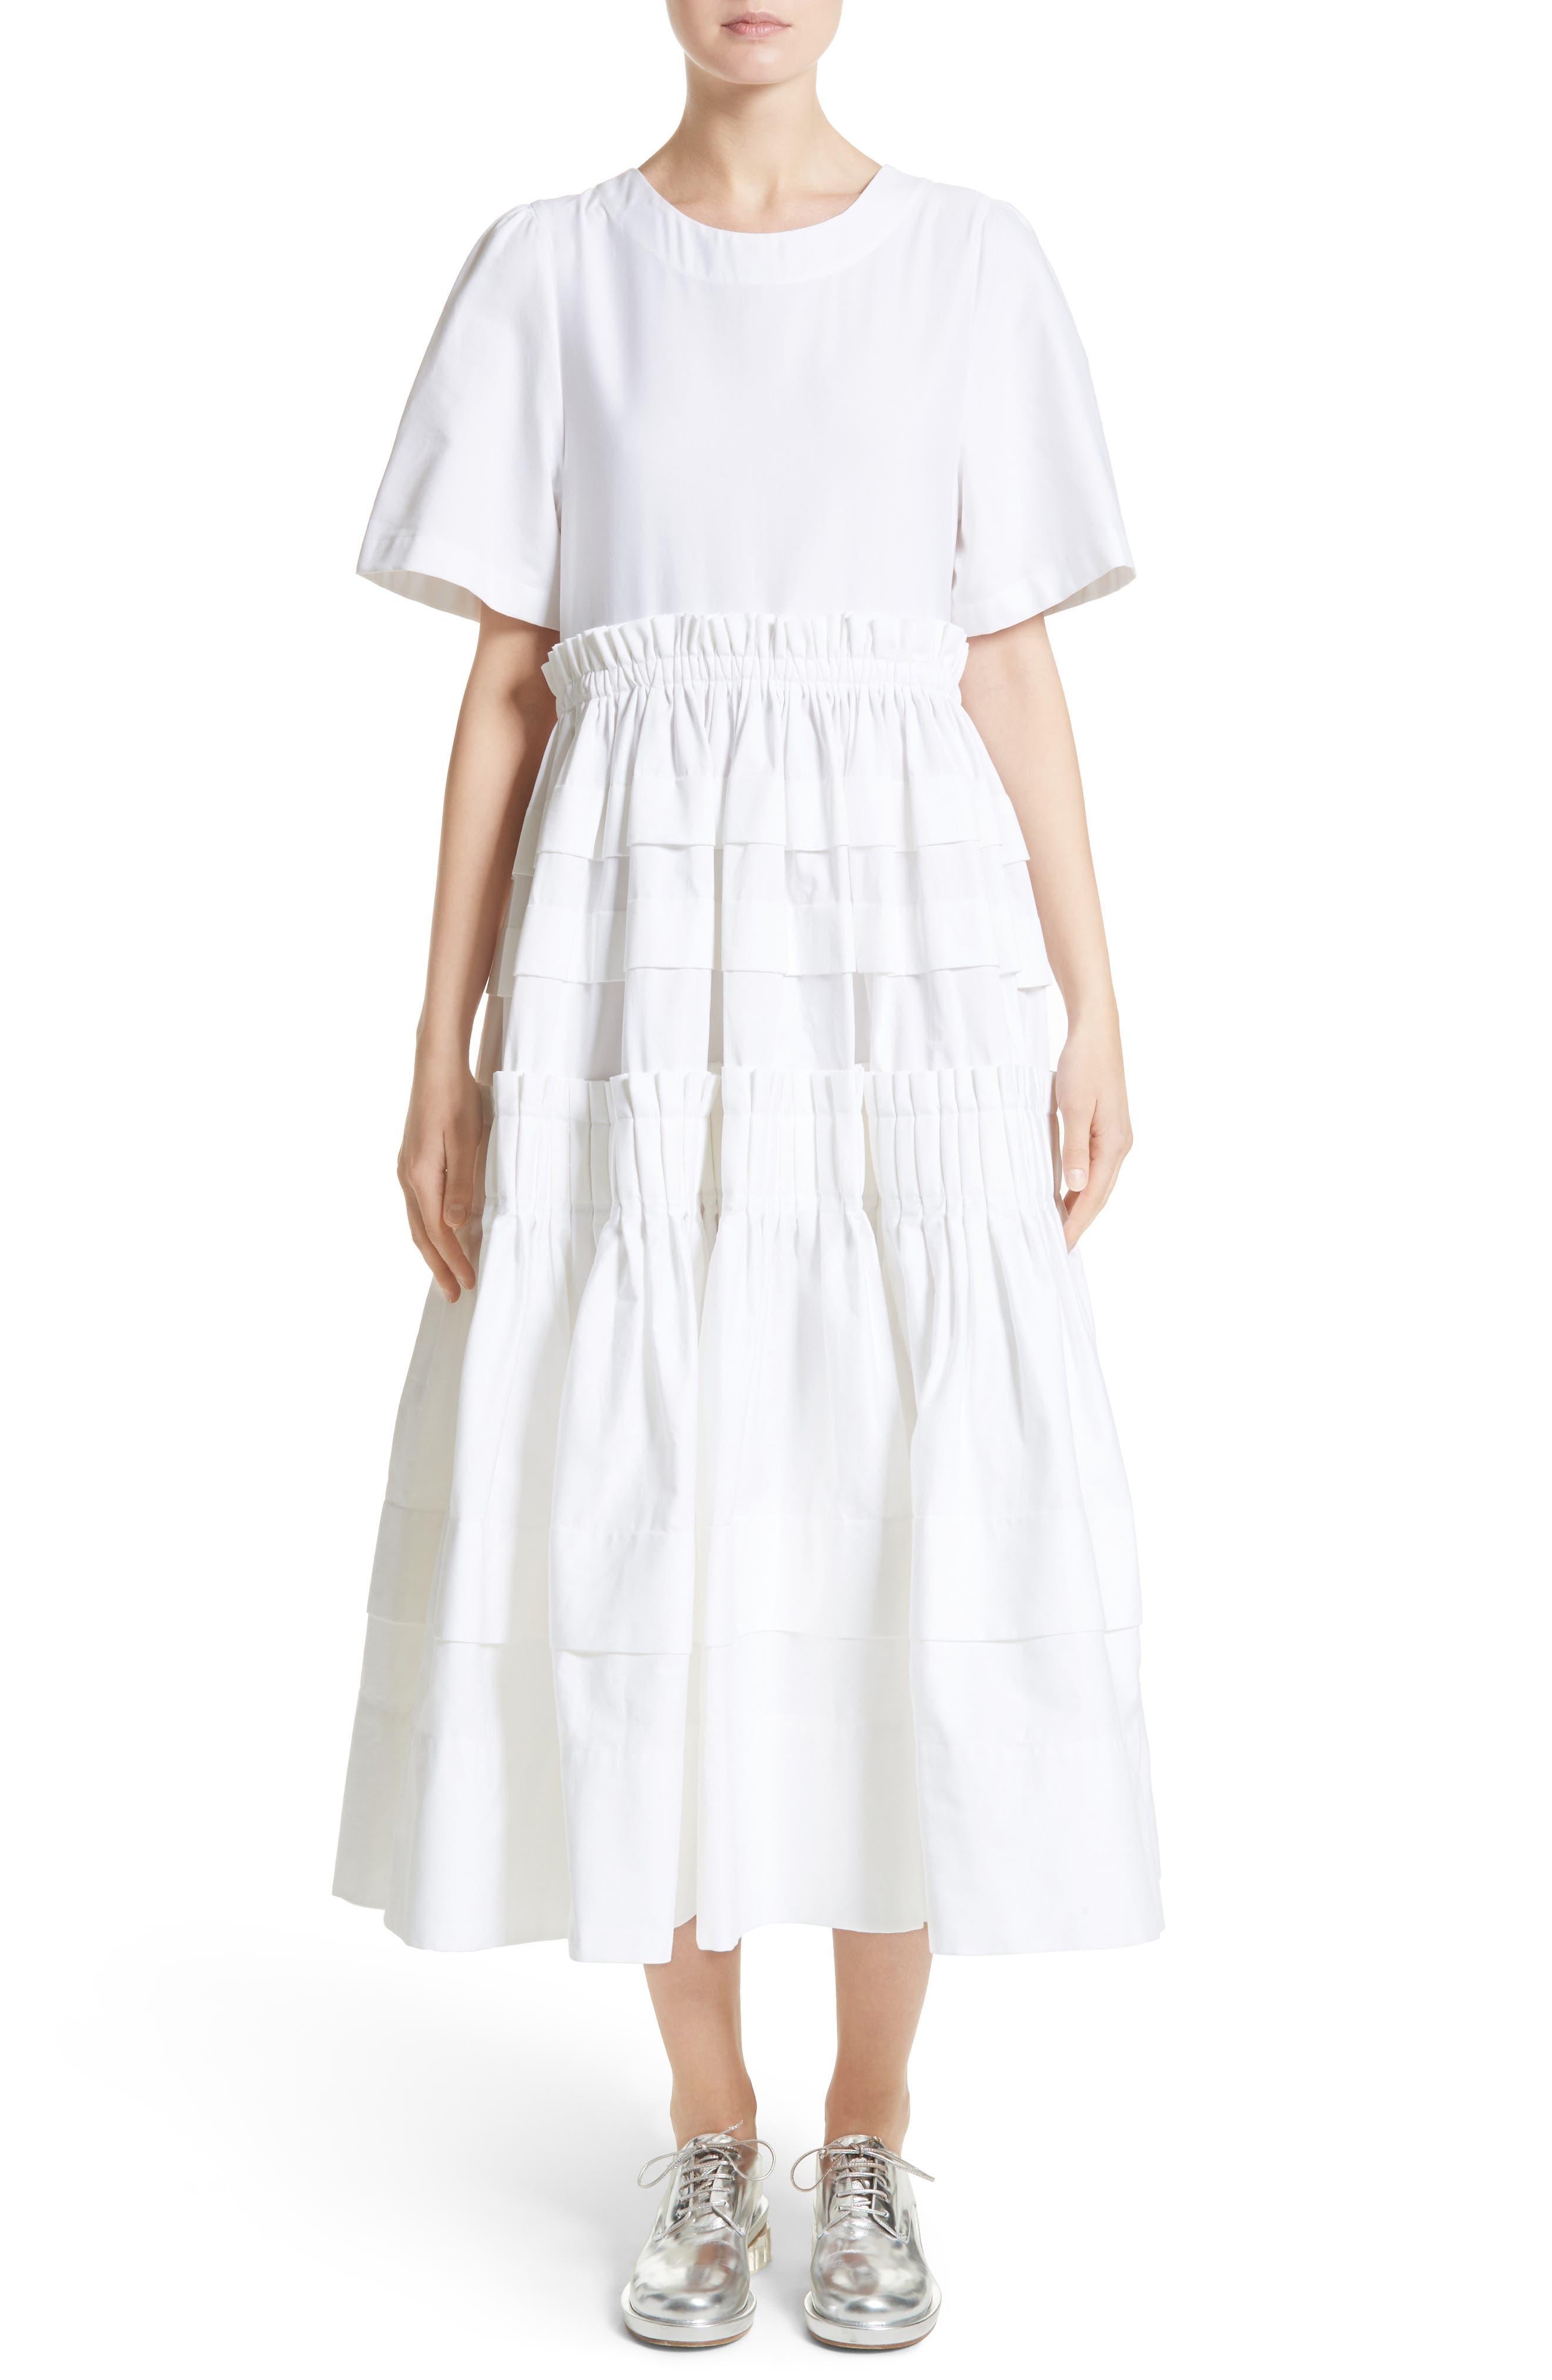 Mathilda Maxi Dress,                             Main thumbnail 1, color,                             White